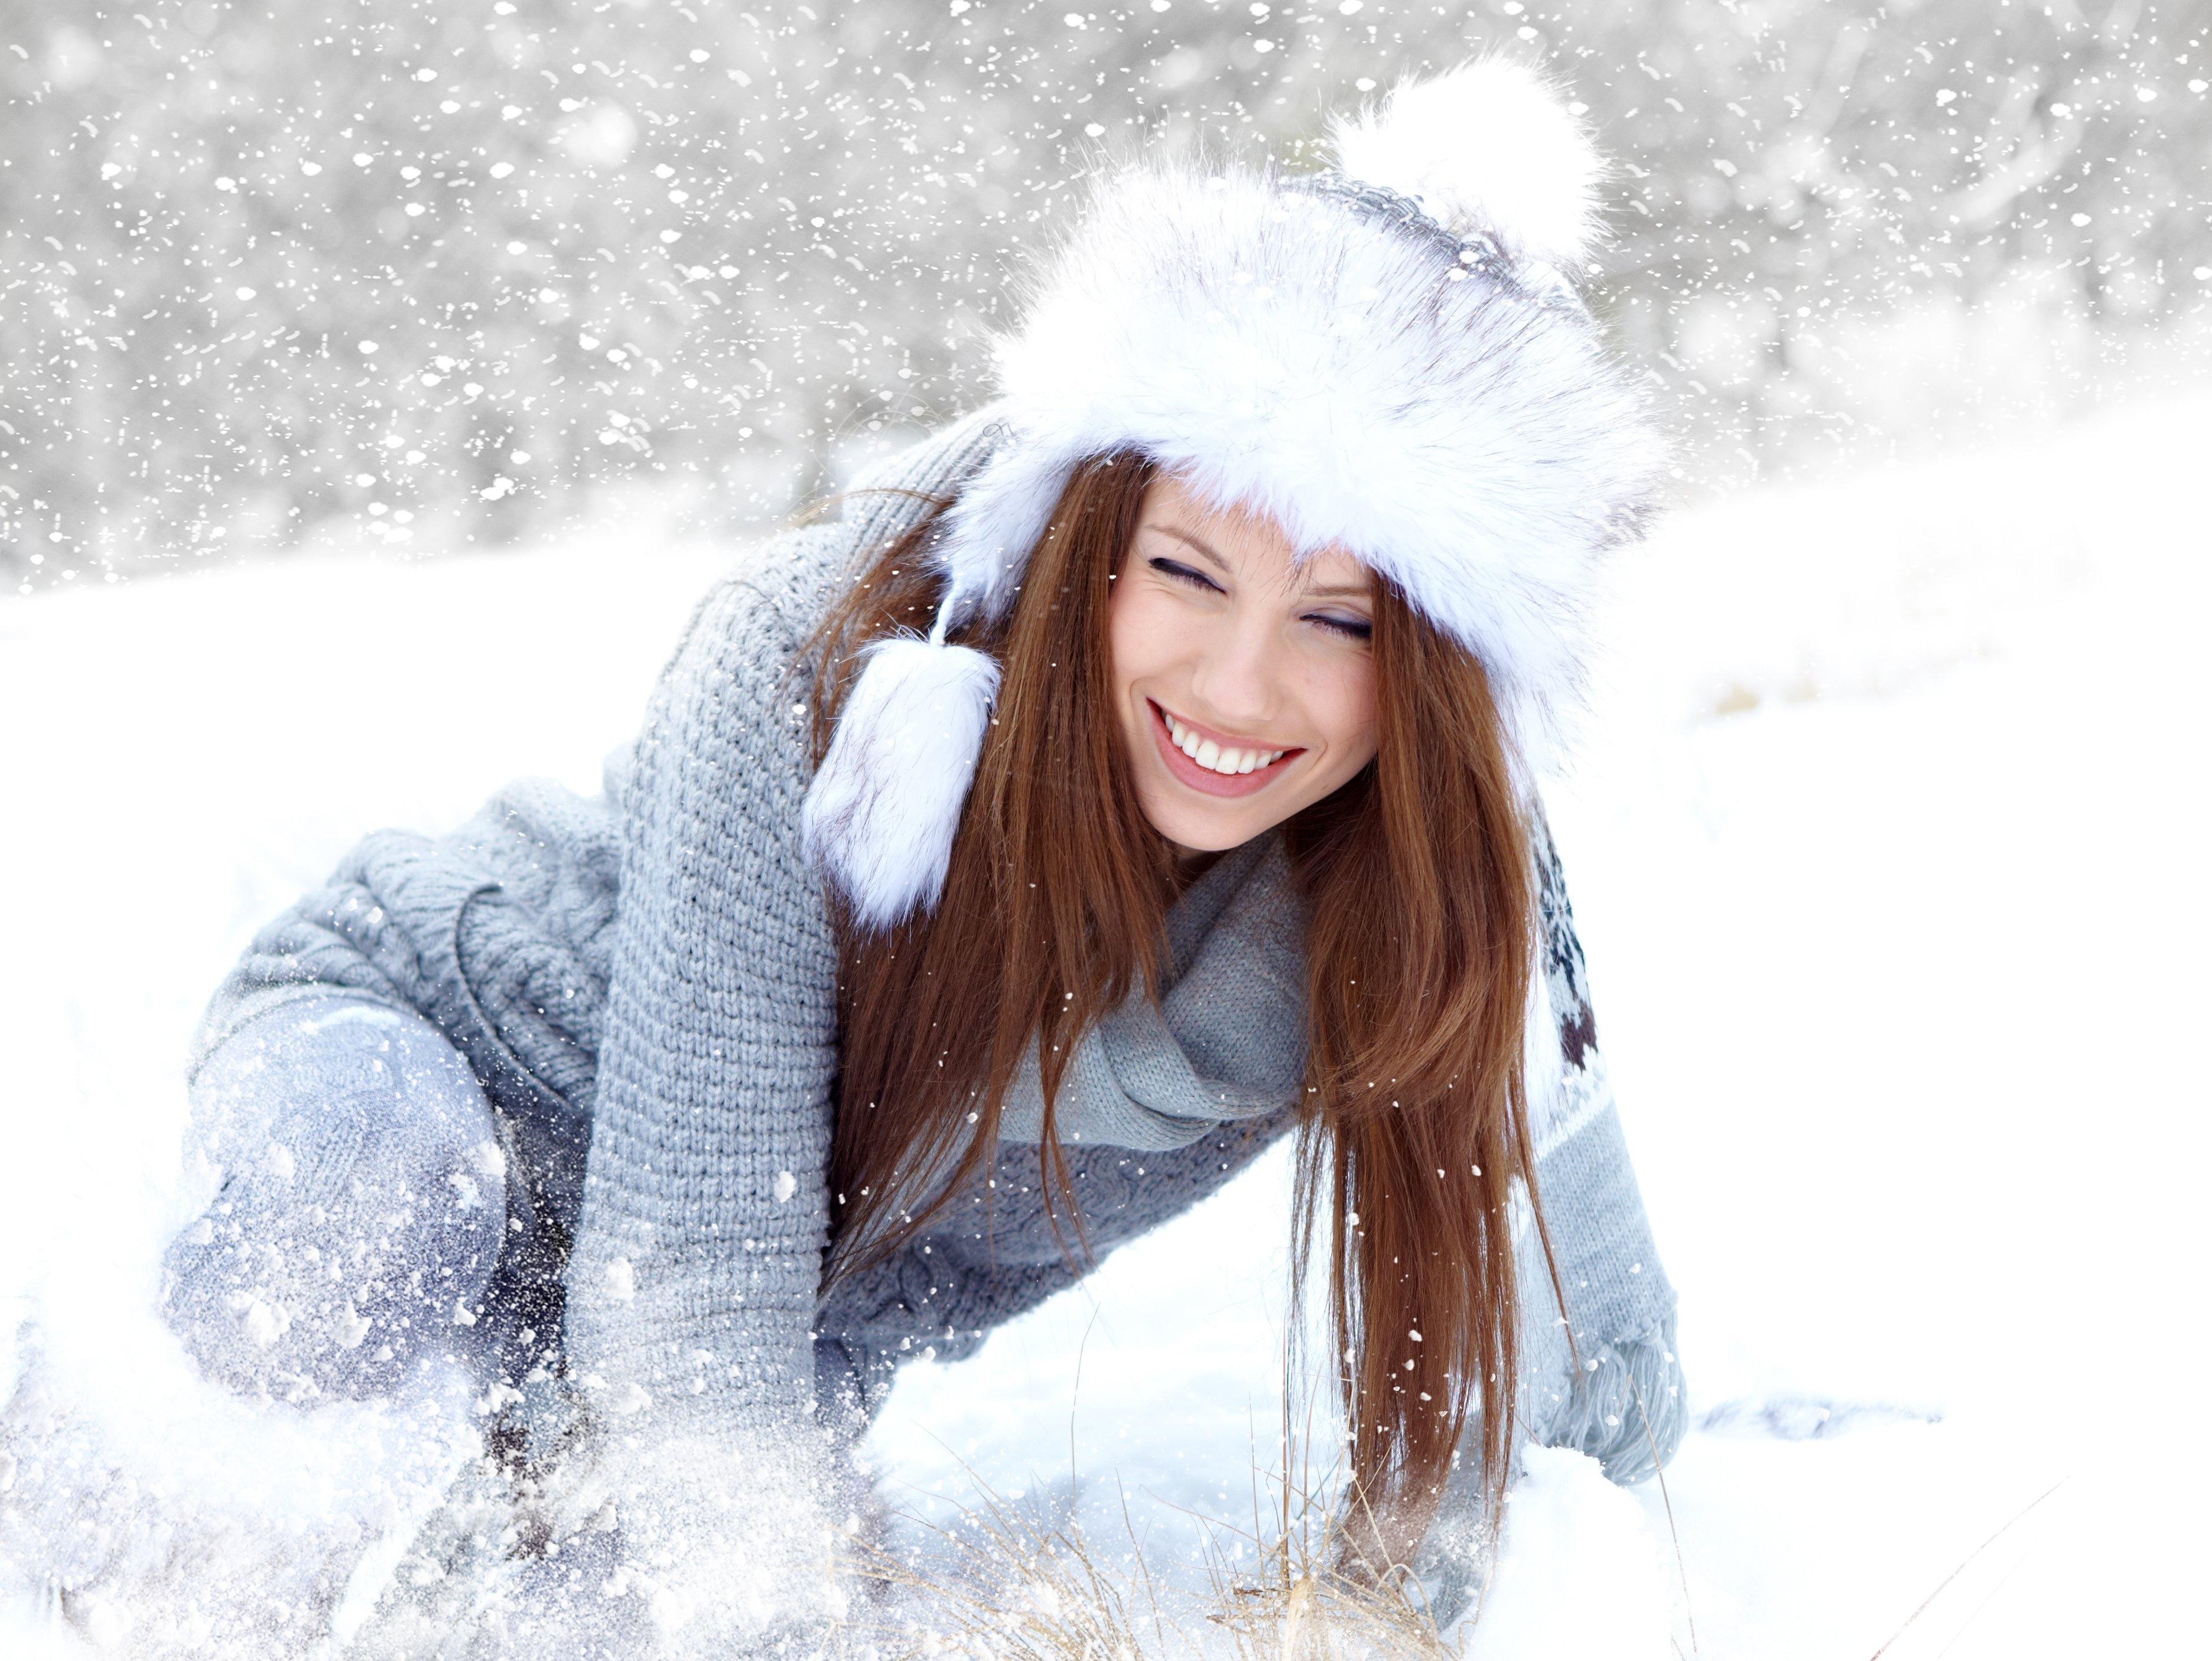 Голые девушки вдвоем на снегу 86